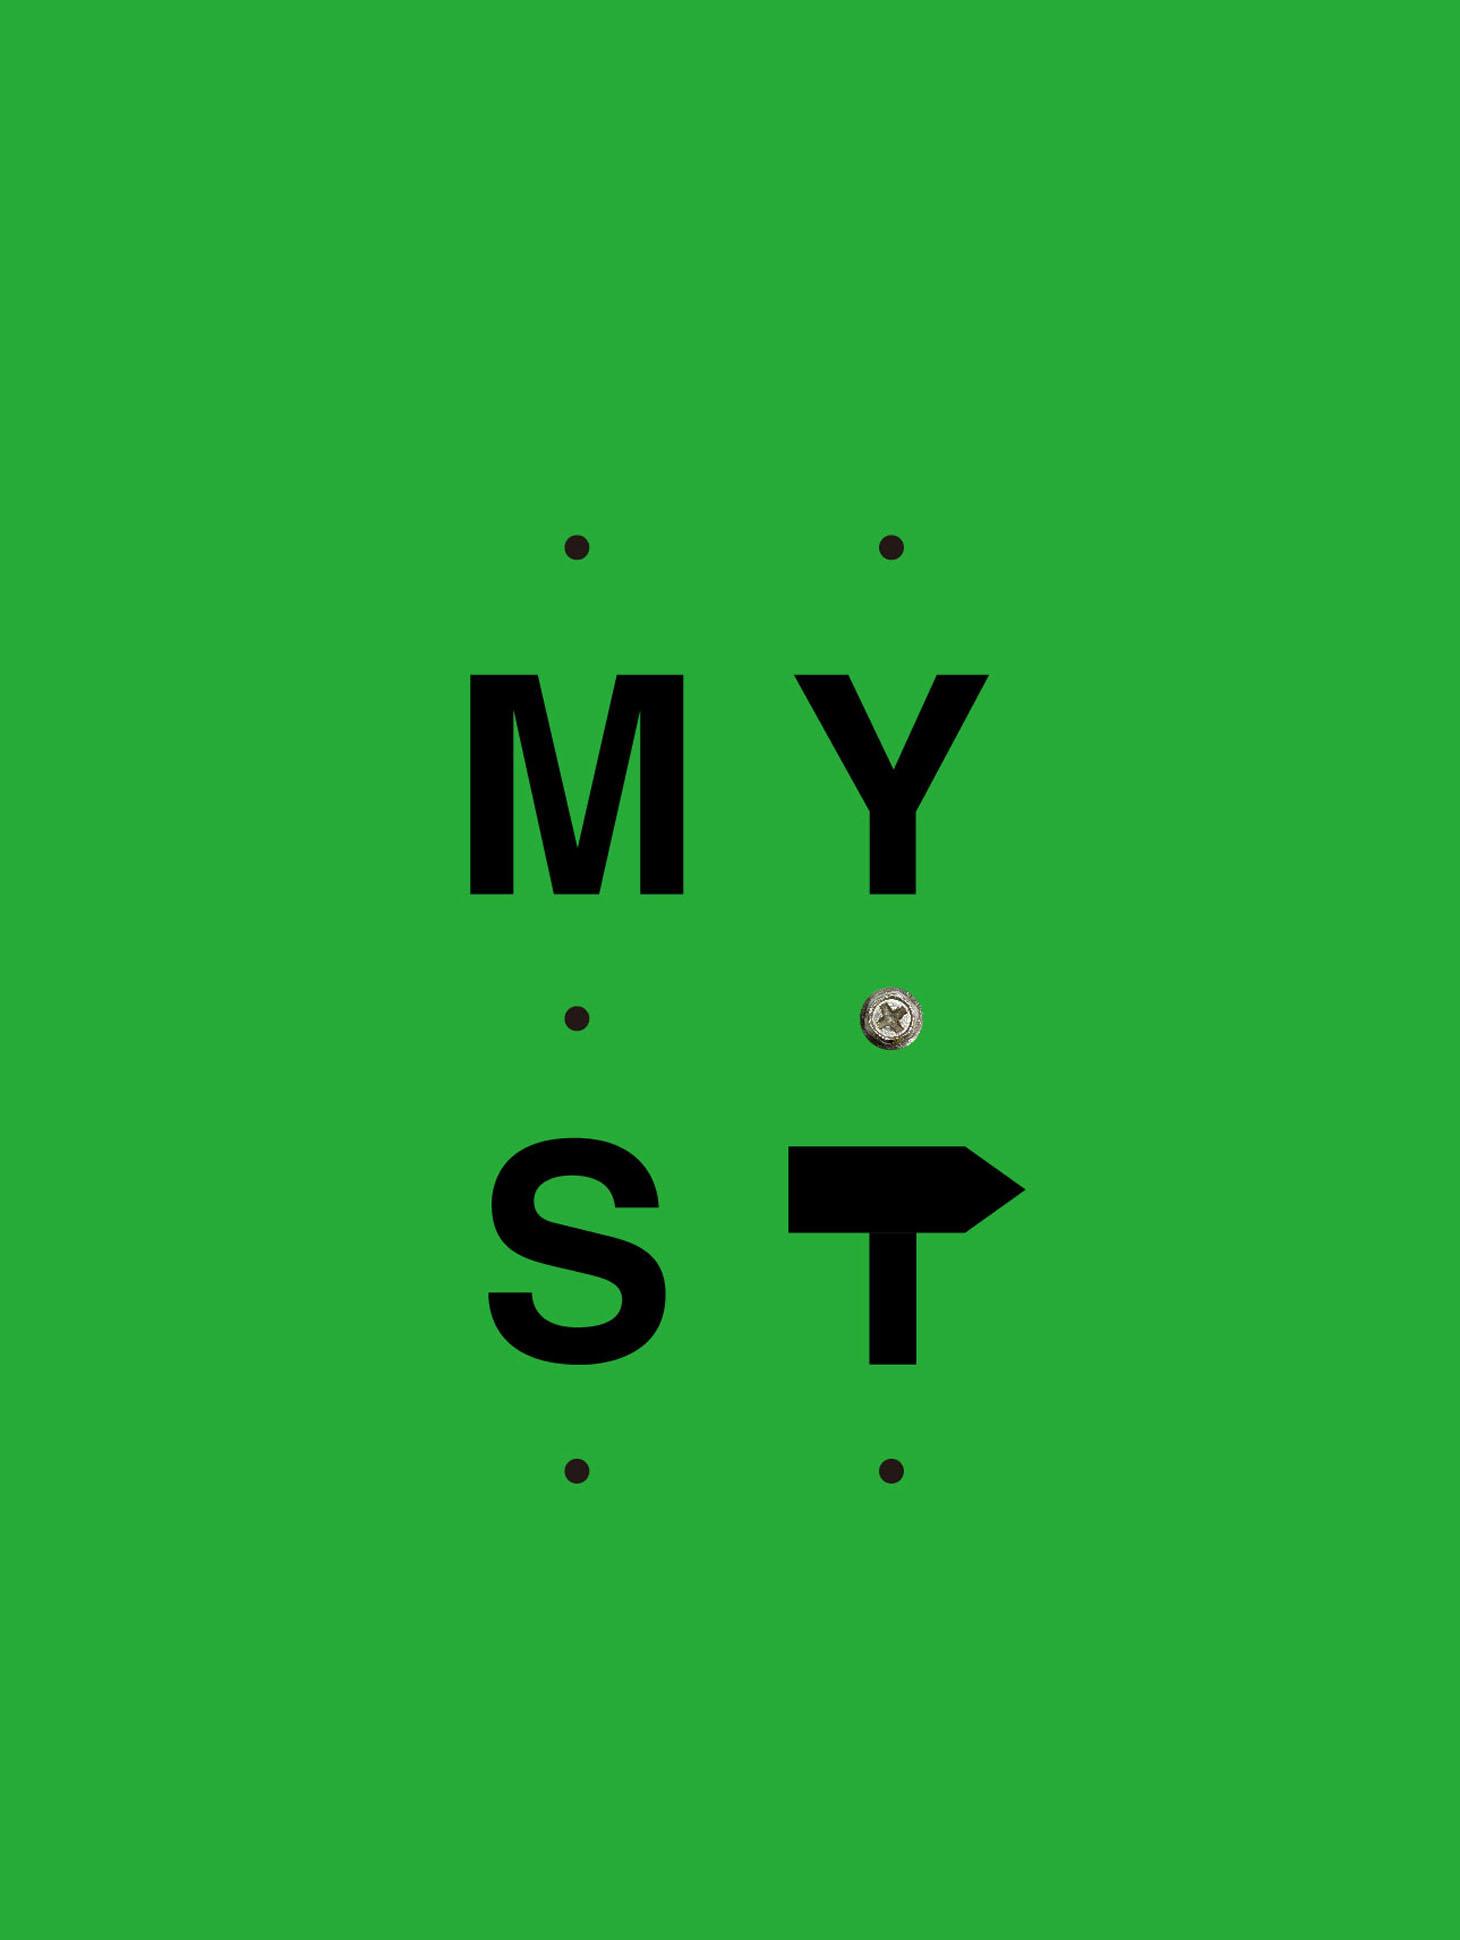 730x970_myst